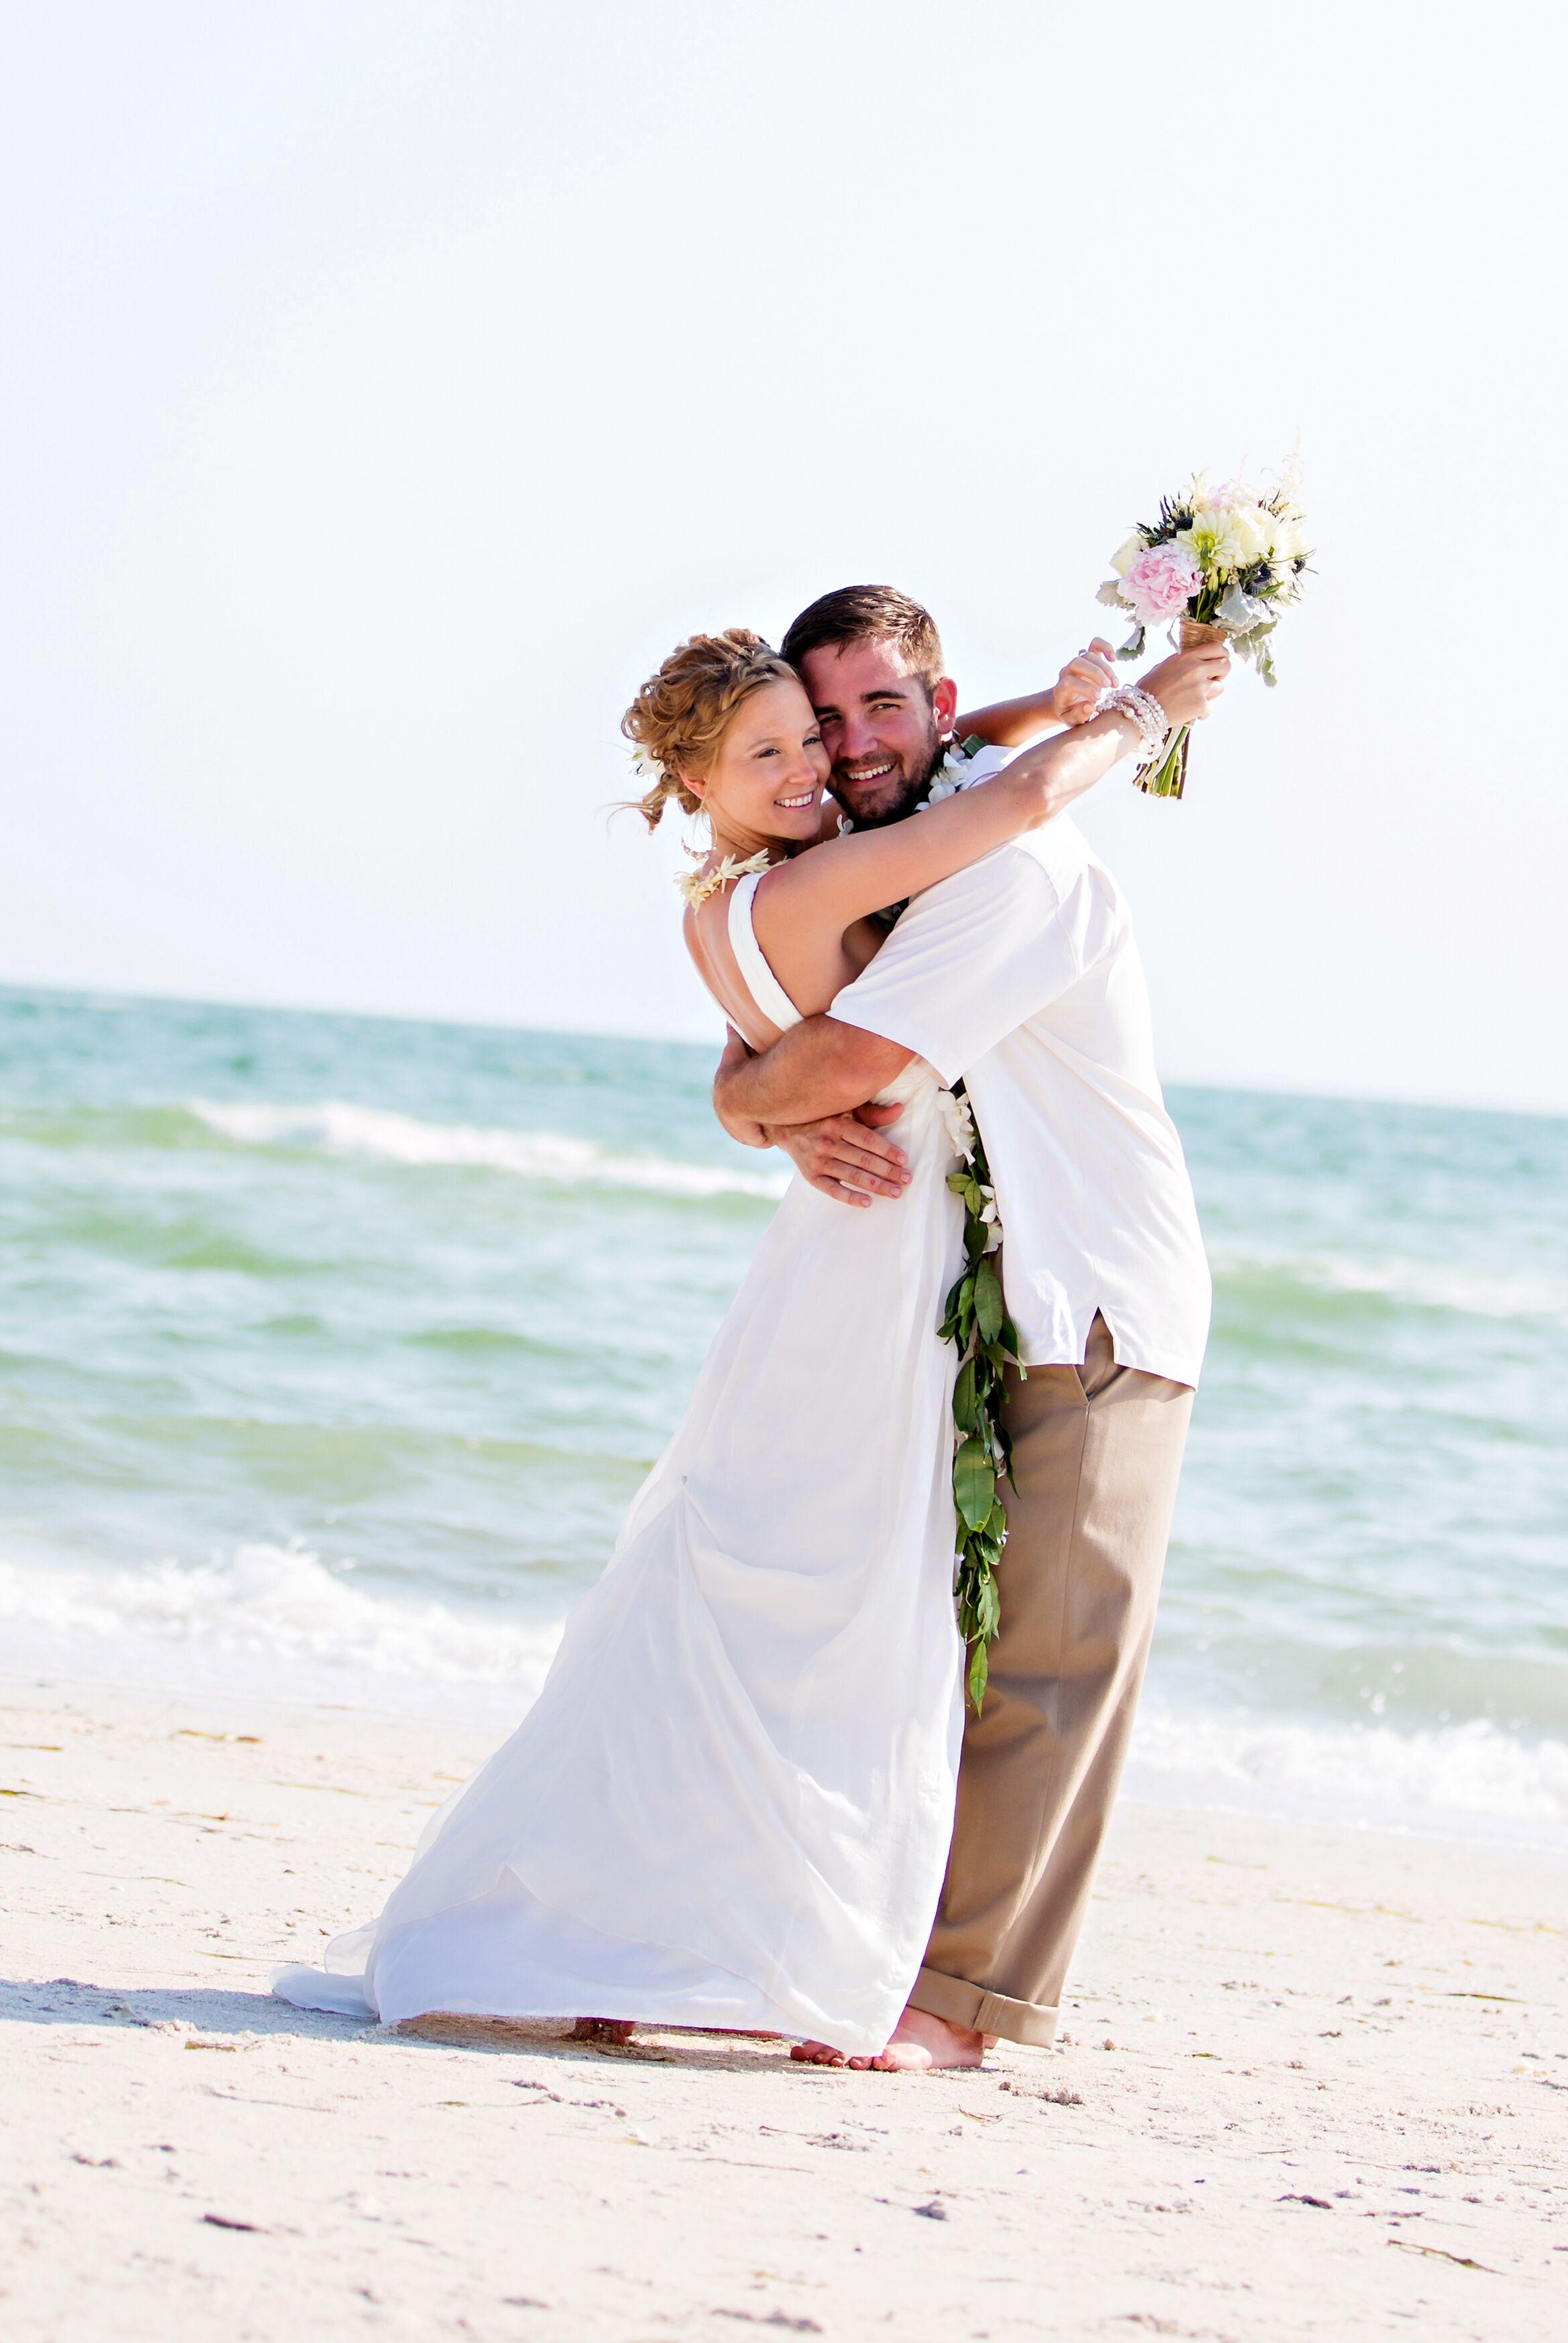 A Casual Beach Wedding At Bonita Bay Club In Bonita